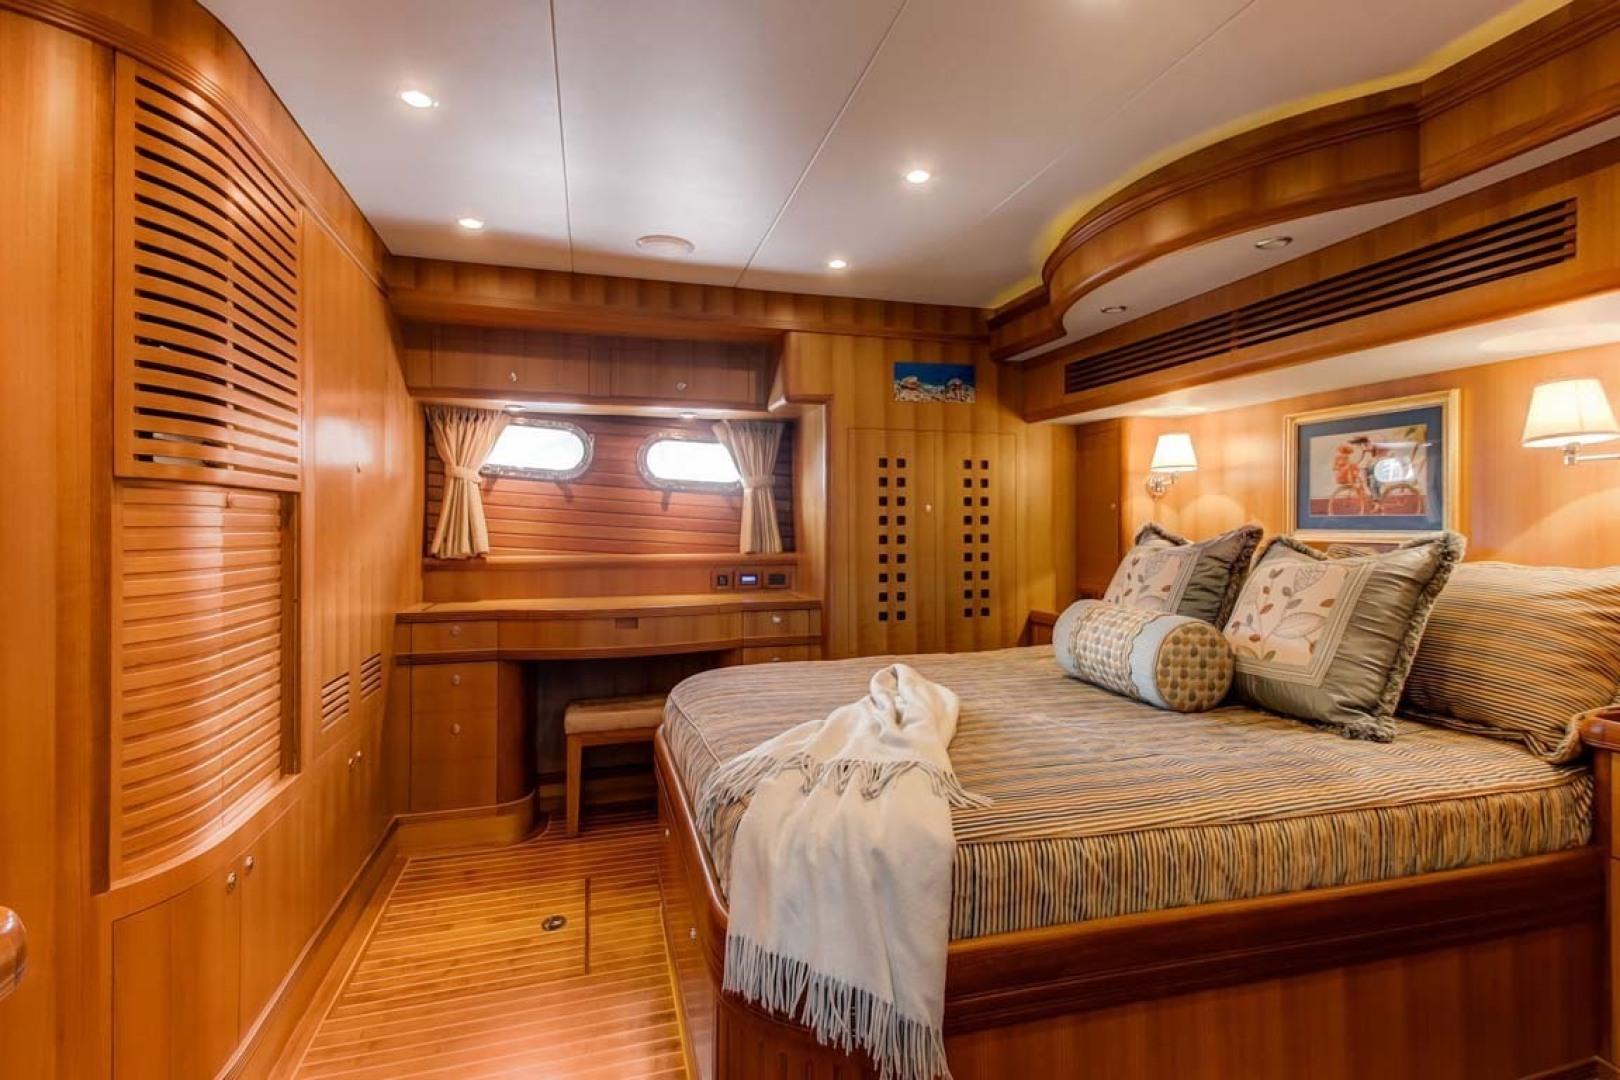 Selene-60 Ocean Trawler 2010-Gypsy Magic Jacksonville-Florida-United States-Master Stateroom-1346749   Thumbnail